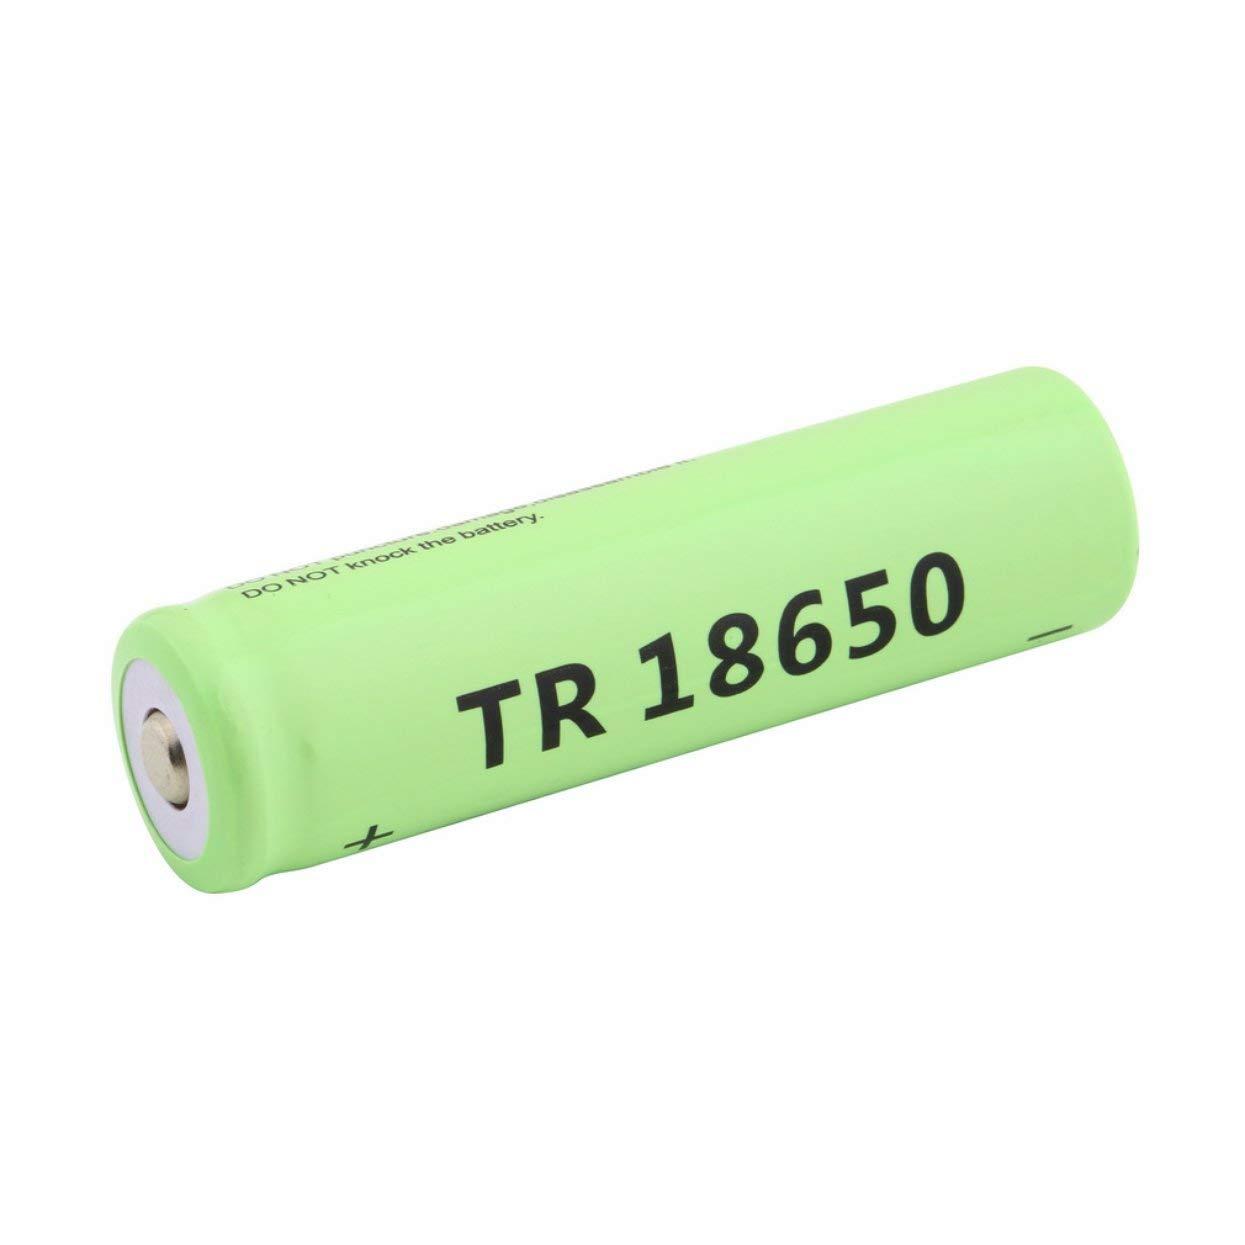 18650 Li-Ion 5800mAh Kapazität 3,7 V Akku für LED Taschenlampe Blau Taschenlampe Batterien LoveOlvidoD